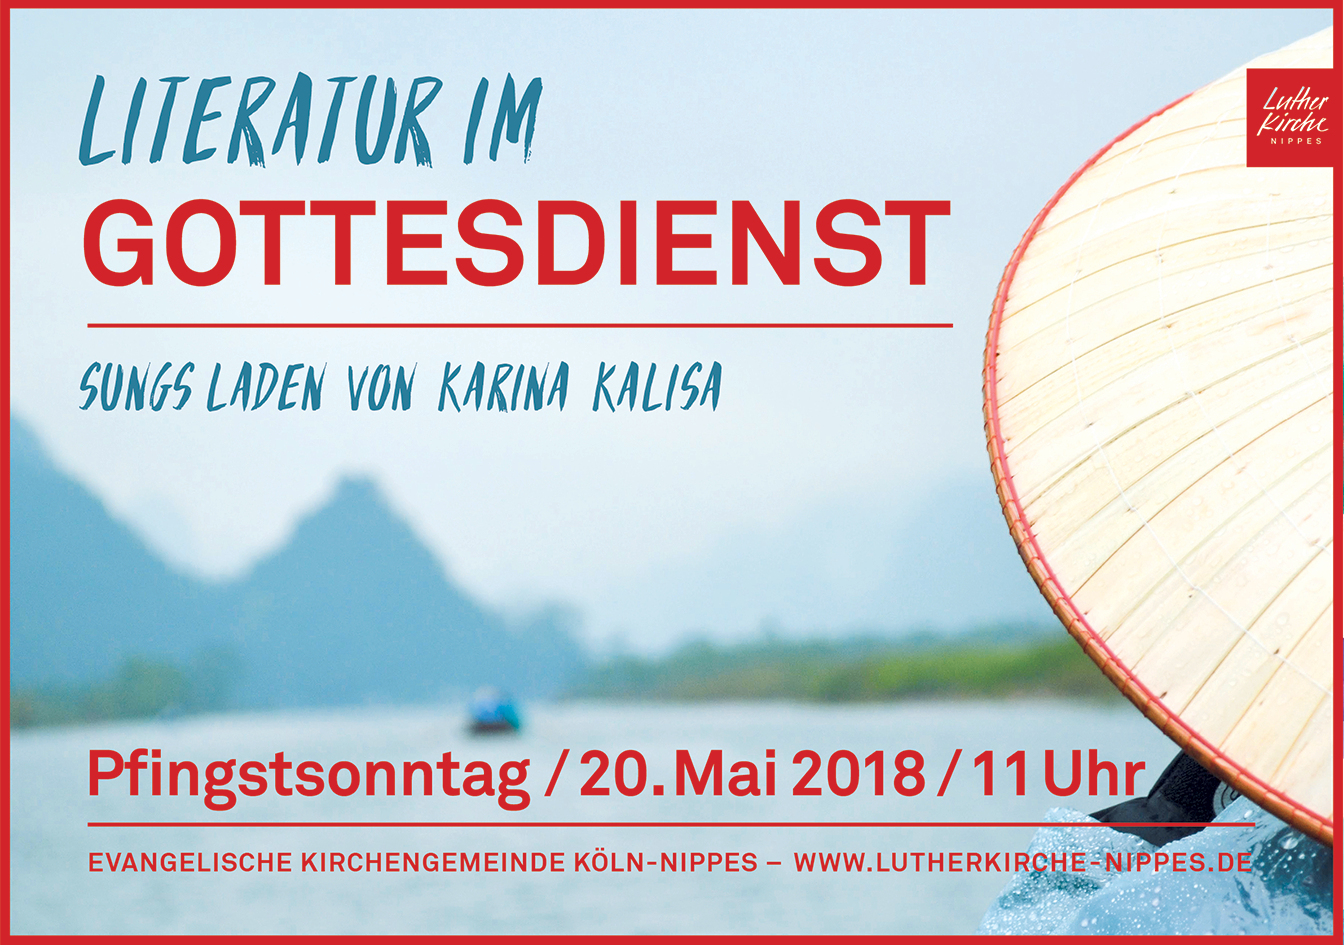 Lutherkirche Nippes Y O U H O U